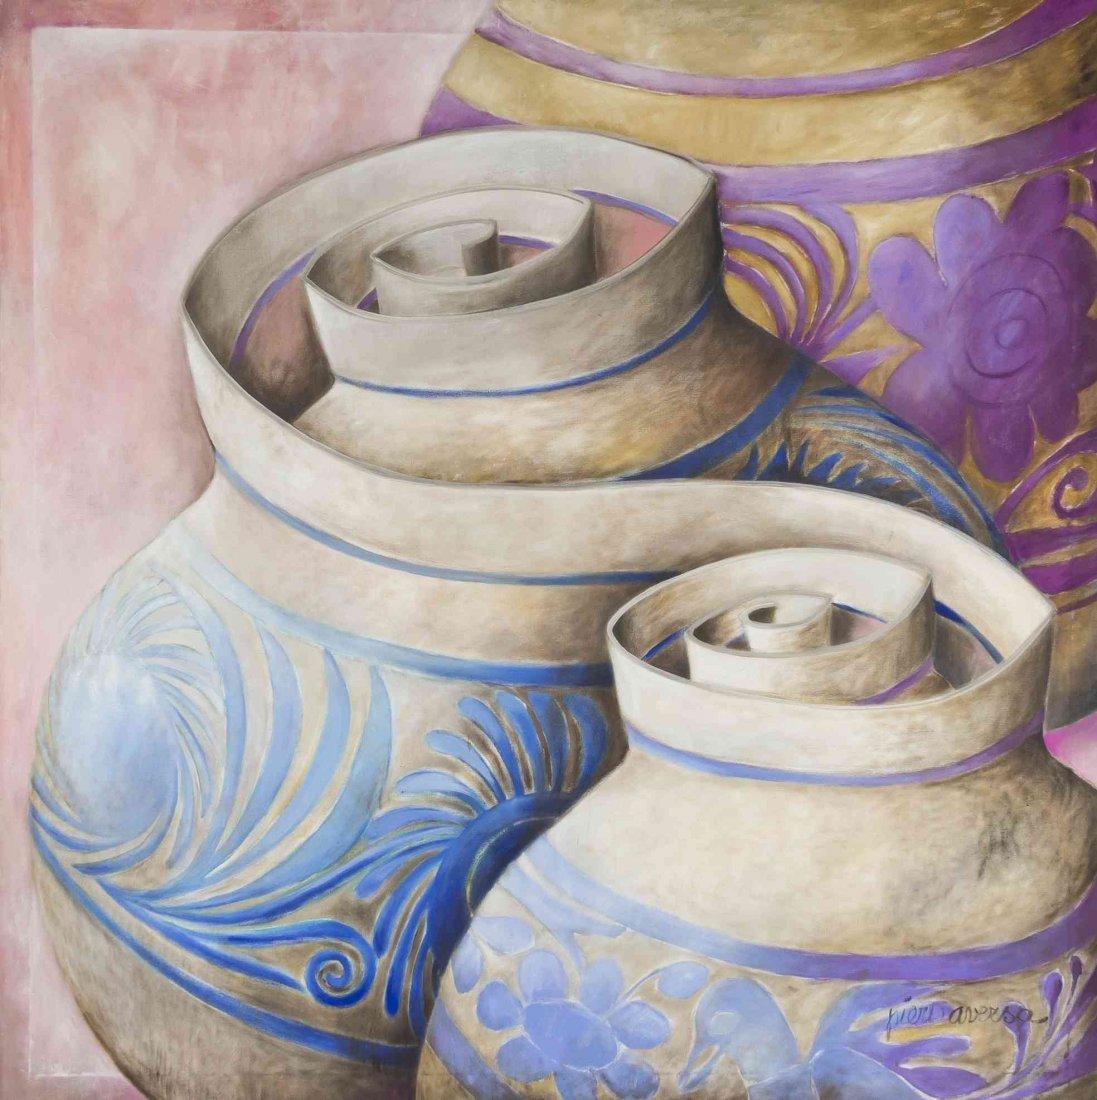 Piero Aversa, (Italian, 1928-1990), Stylized Urns